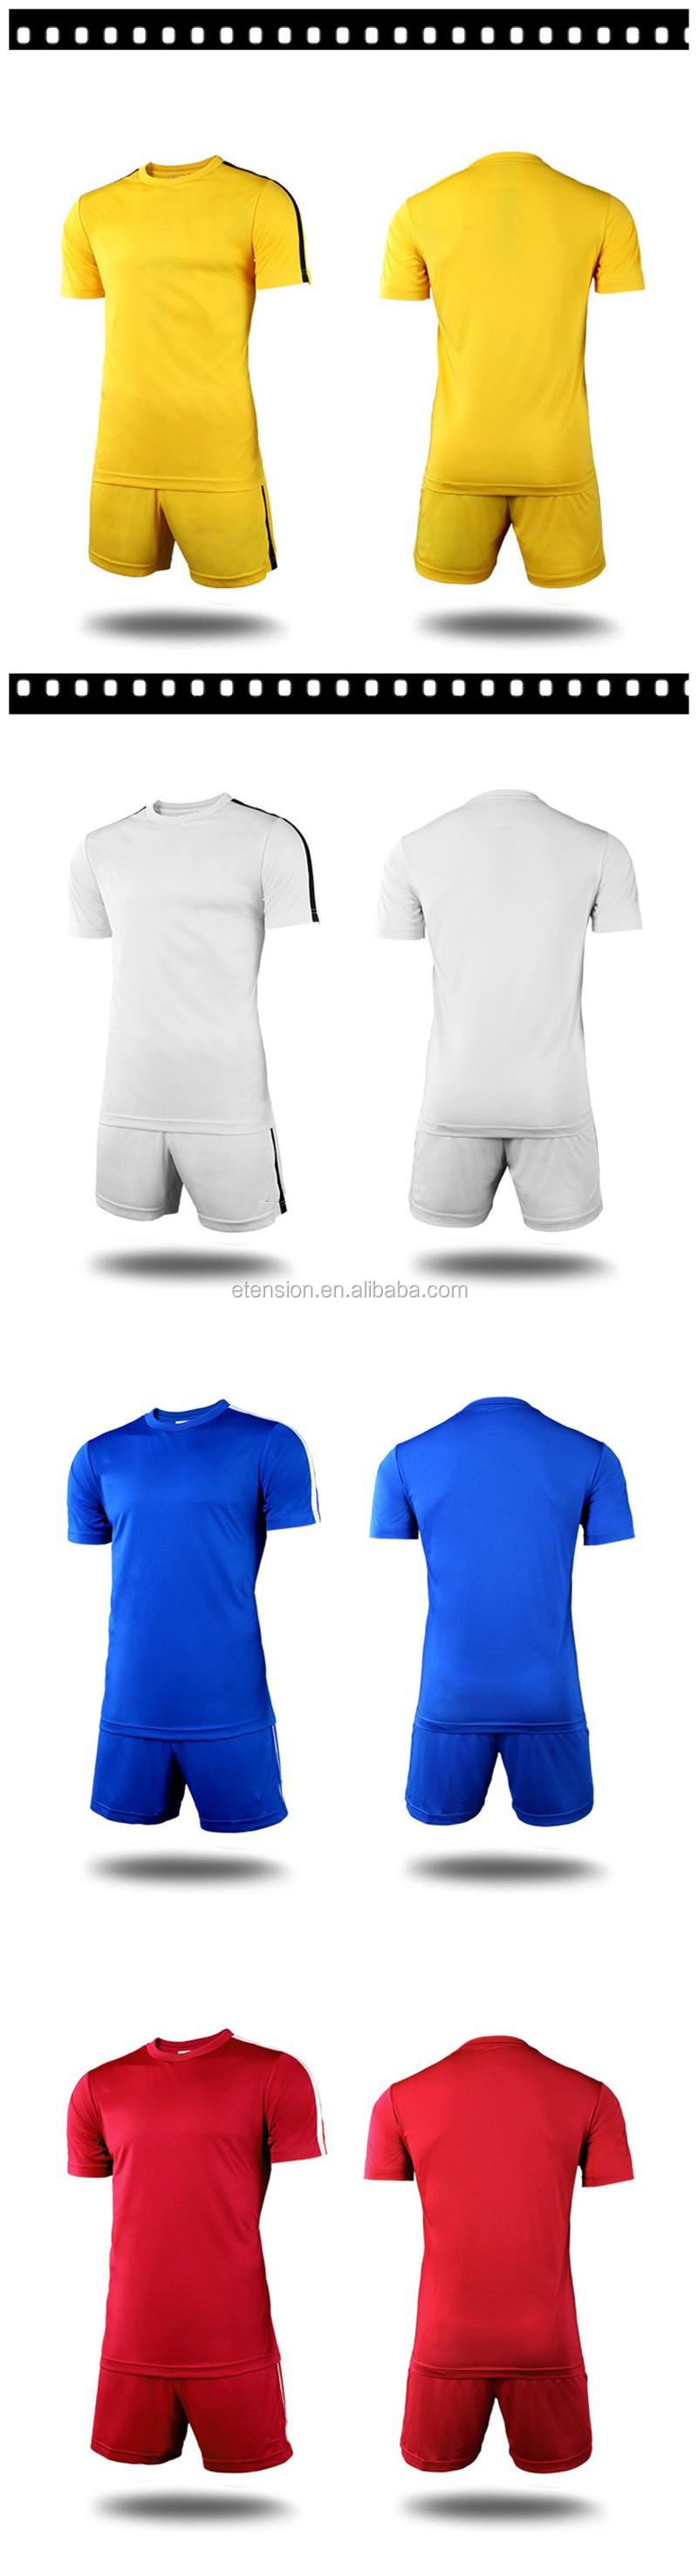 men short sleeve suits .jpg